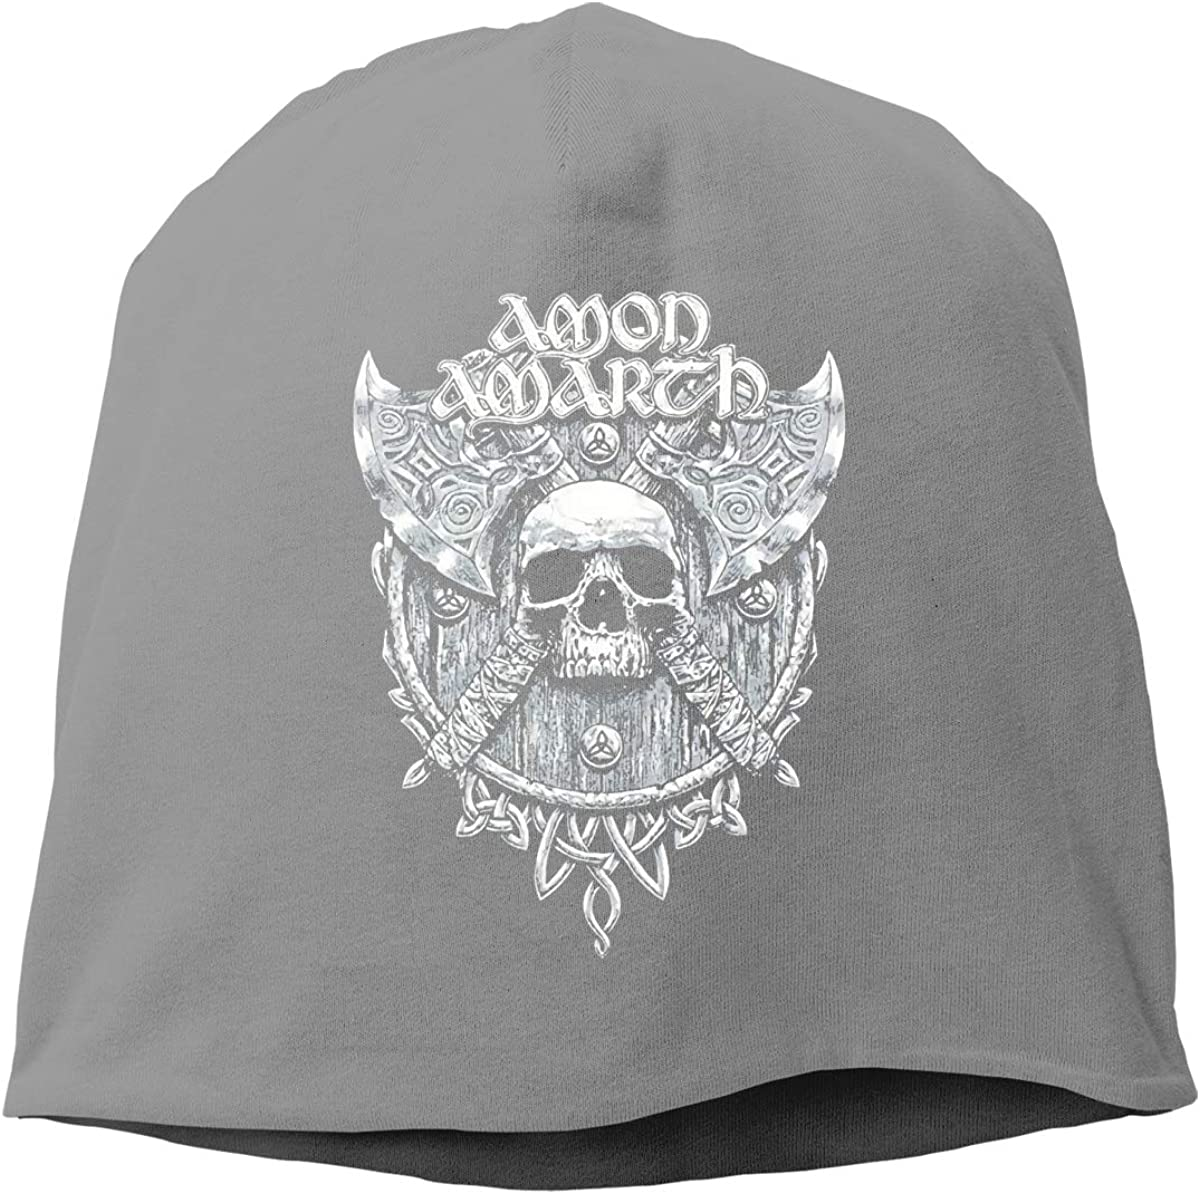 JeffreyENolan Amon Amarth Hedging Hat Complete Free 5 ☆ popular Shipping H Knitted Unisex Skull